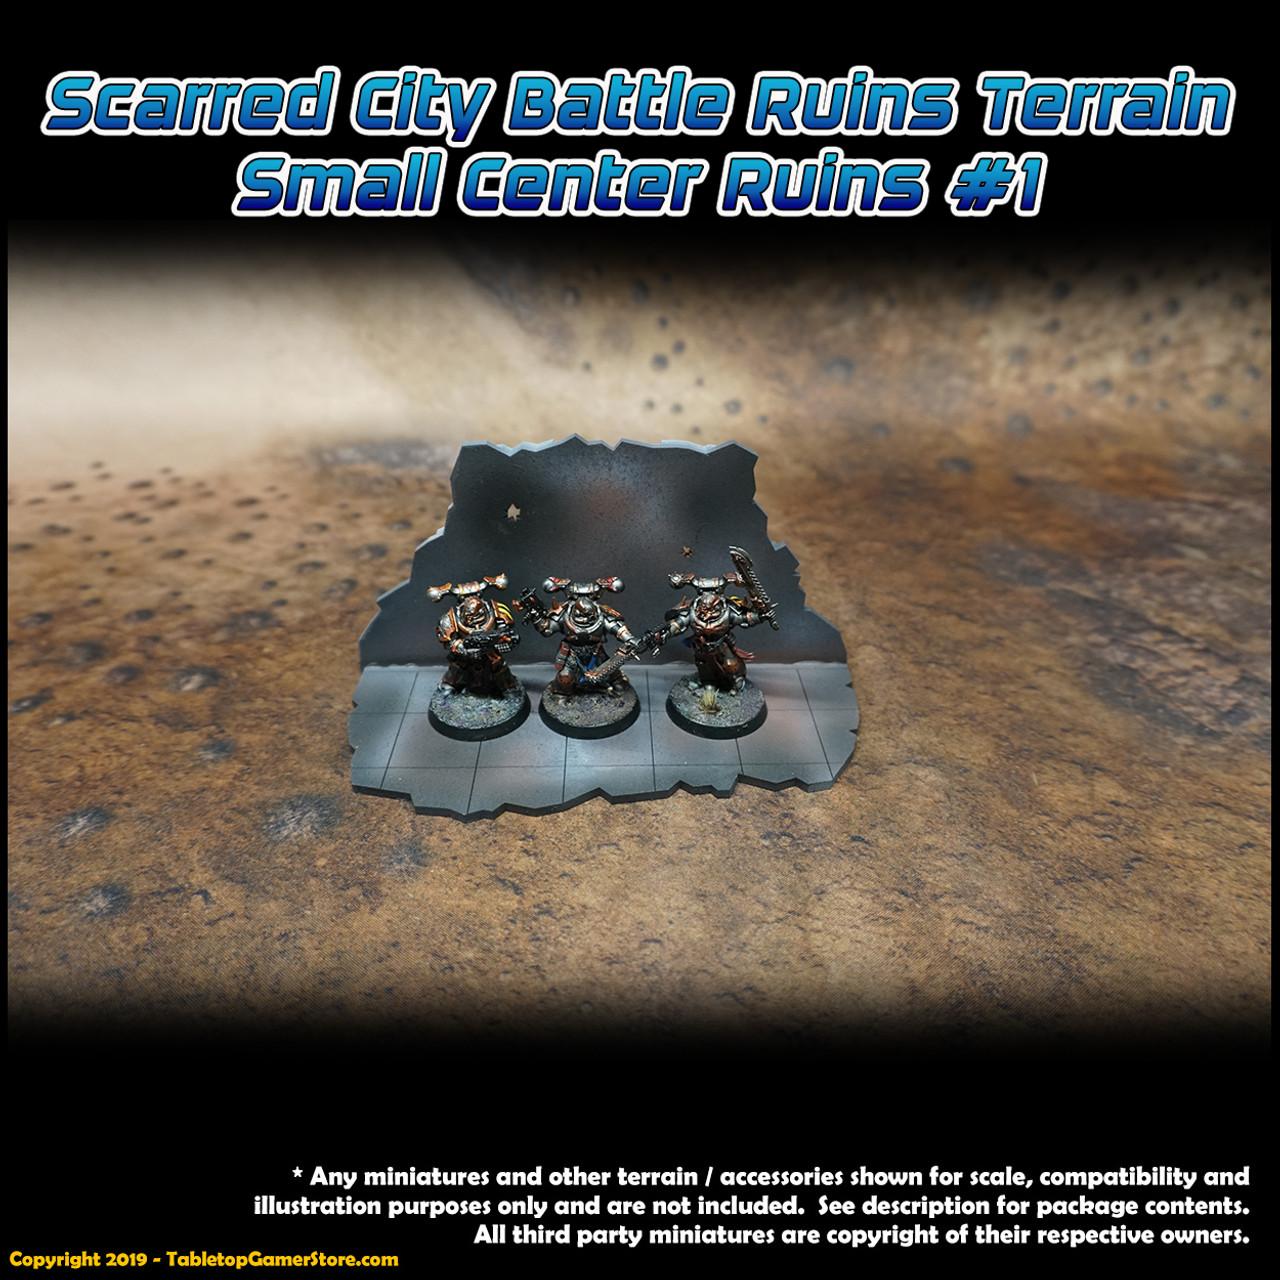 Scarred City Battle Ruins Terrain - Small Center Ruins 1